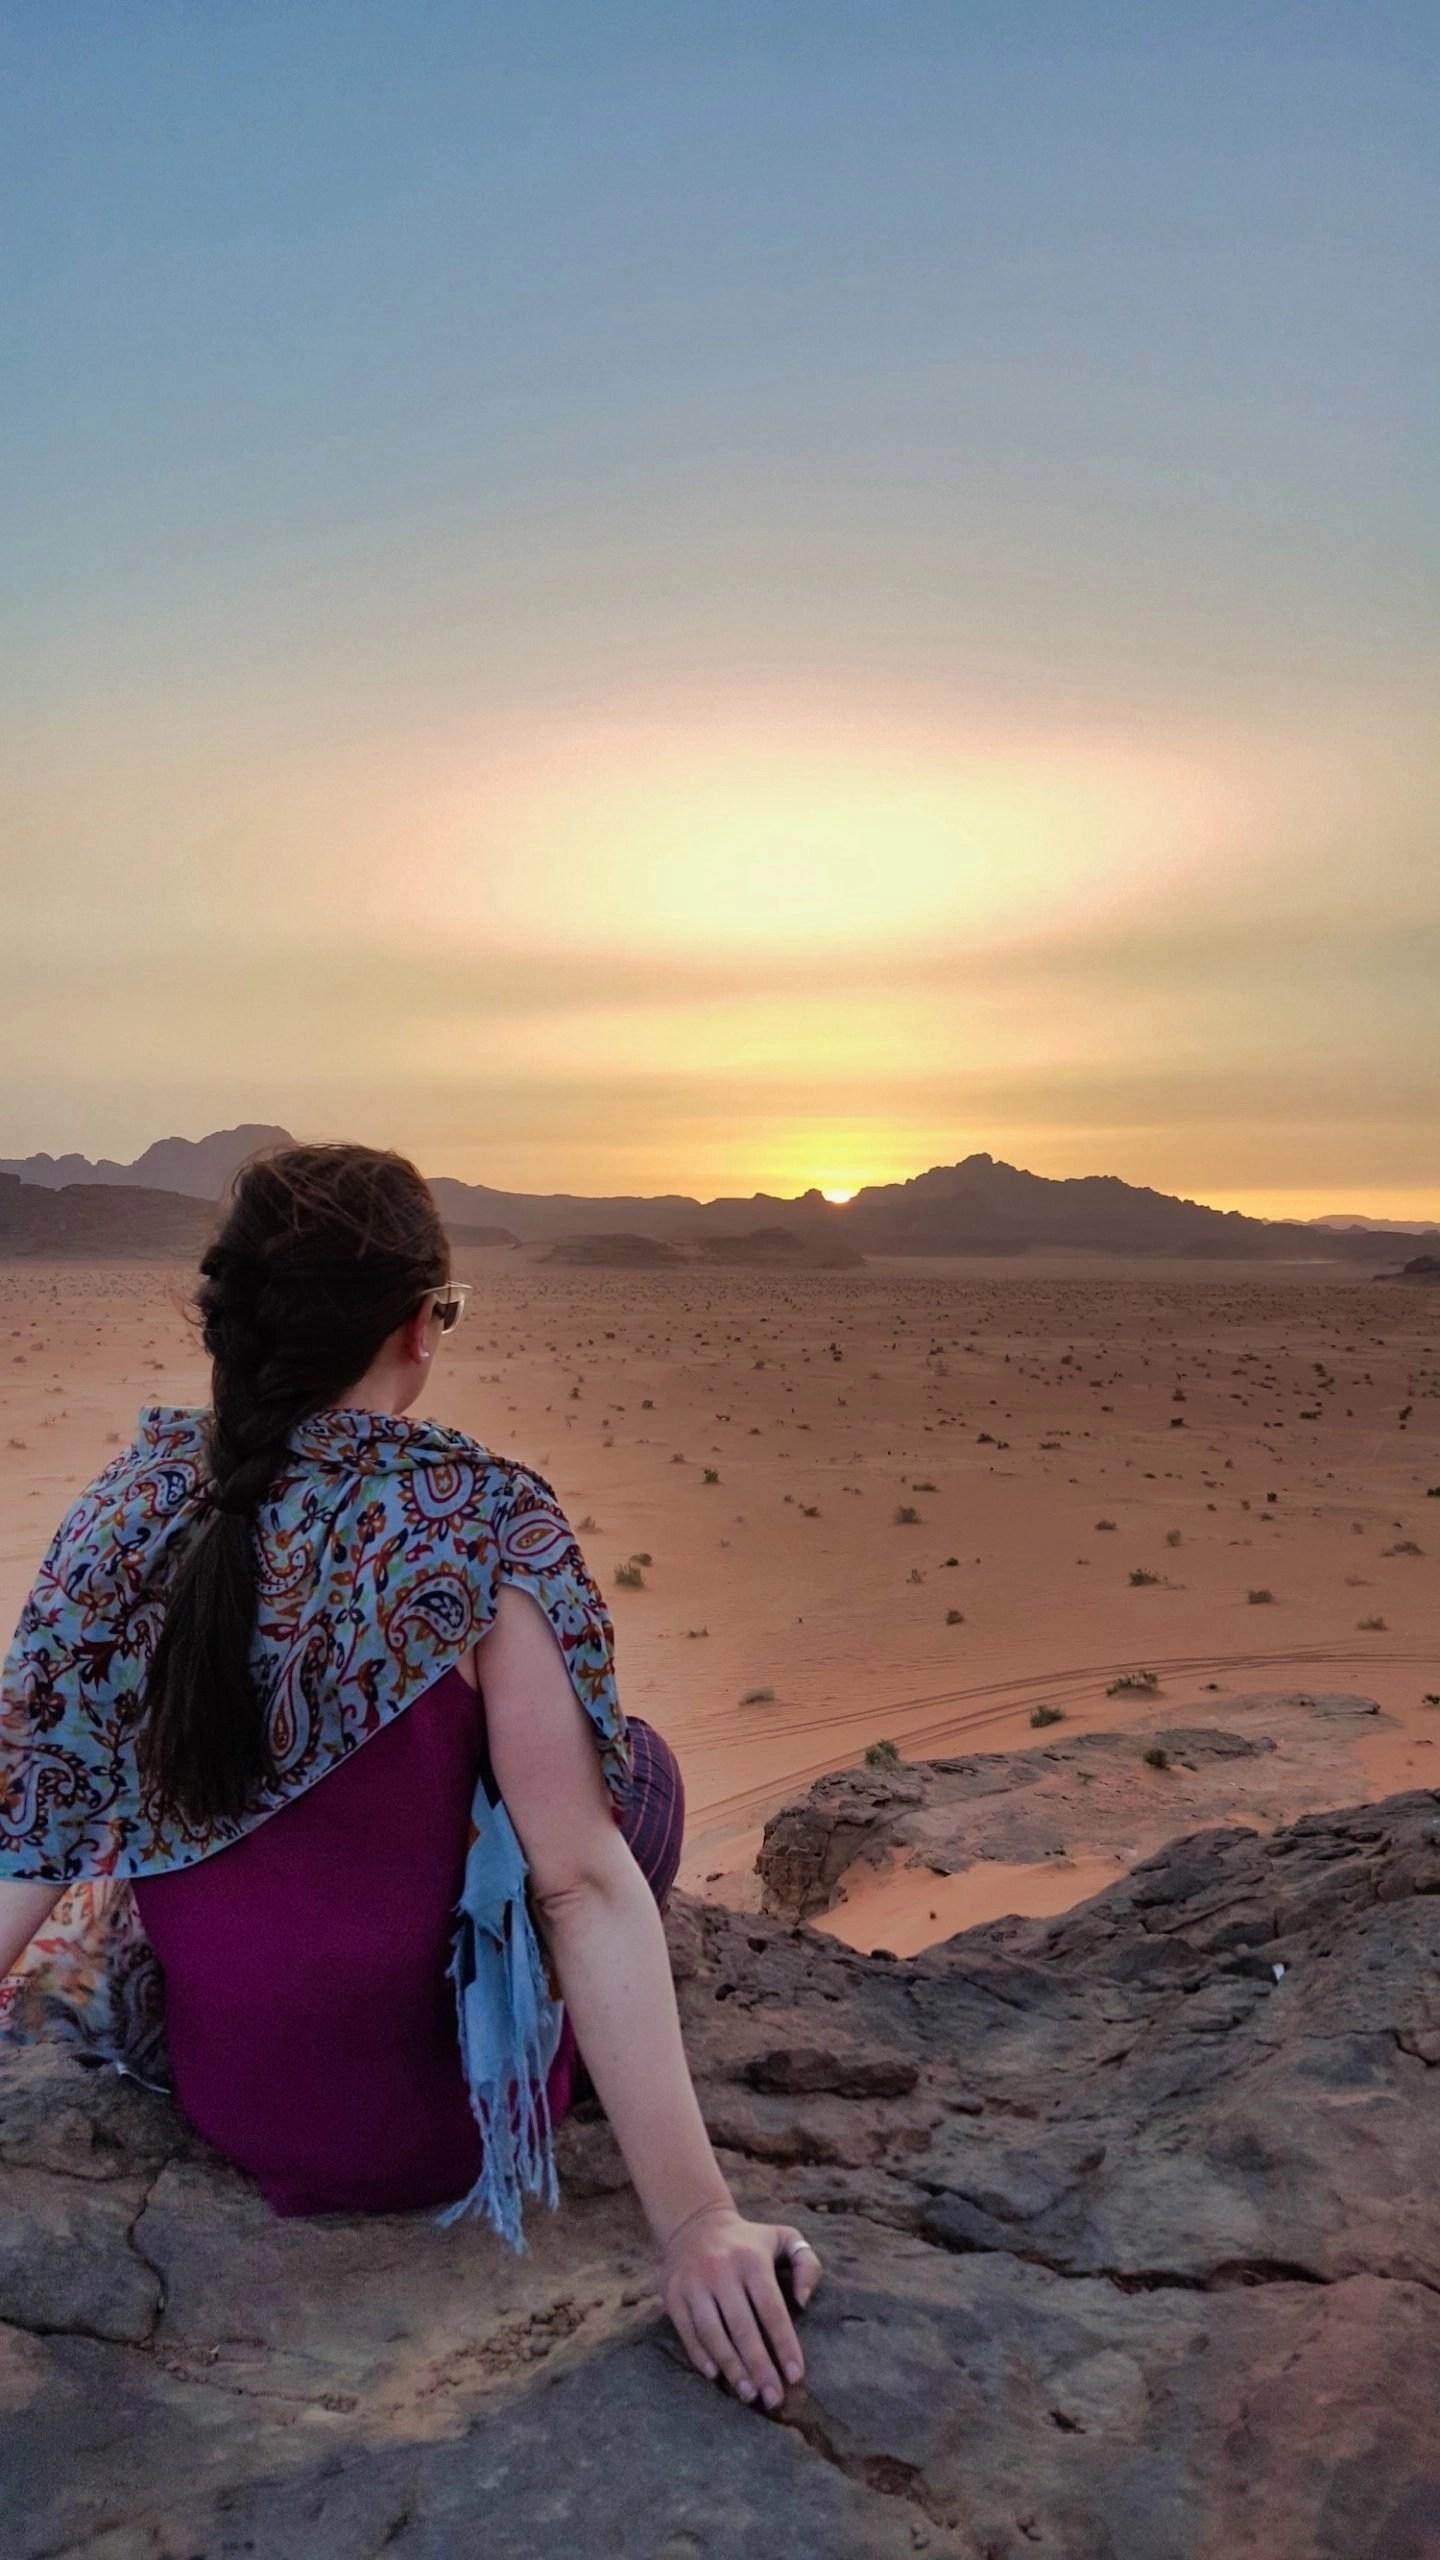 10 Days in Jordan - Valerie at Sunset in Wadi Rum